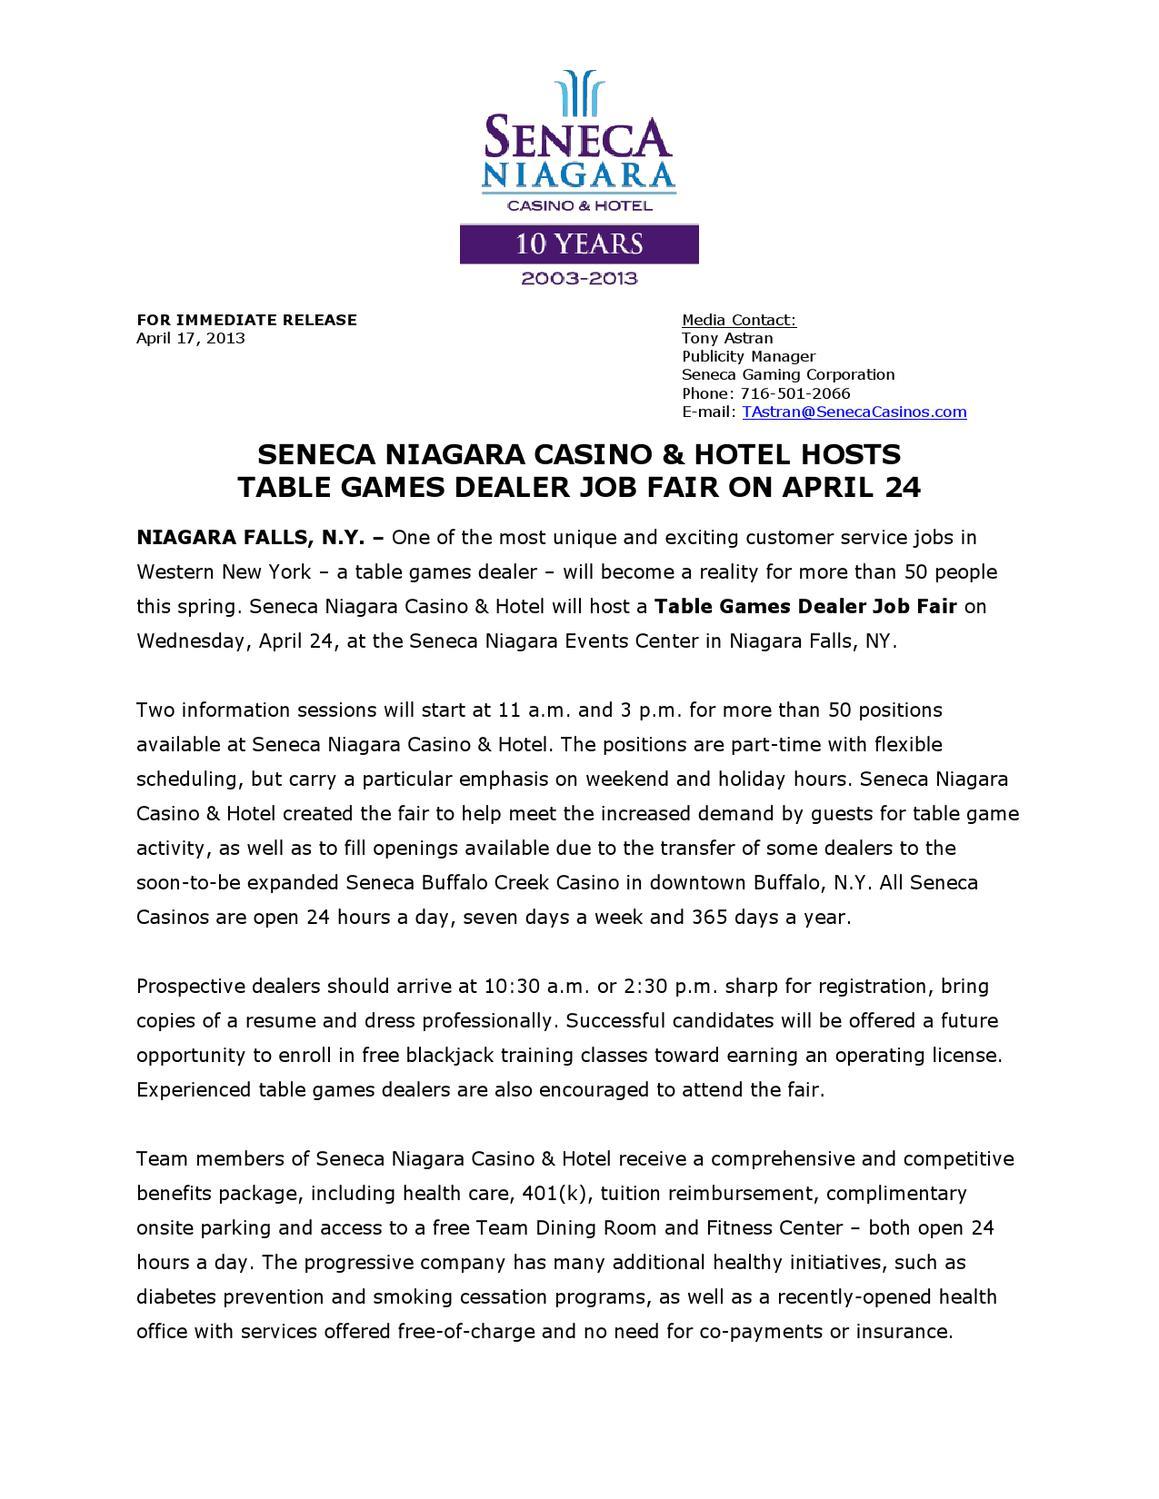 Seneca Niagara Casino Hotel Hosts Table Games Dealer Job Fair On